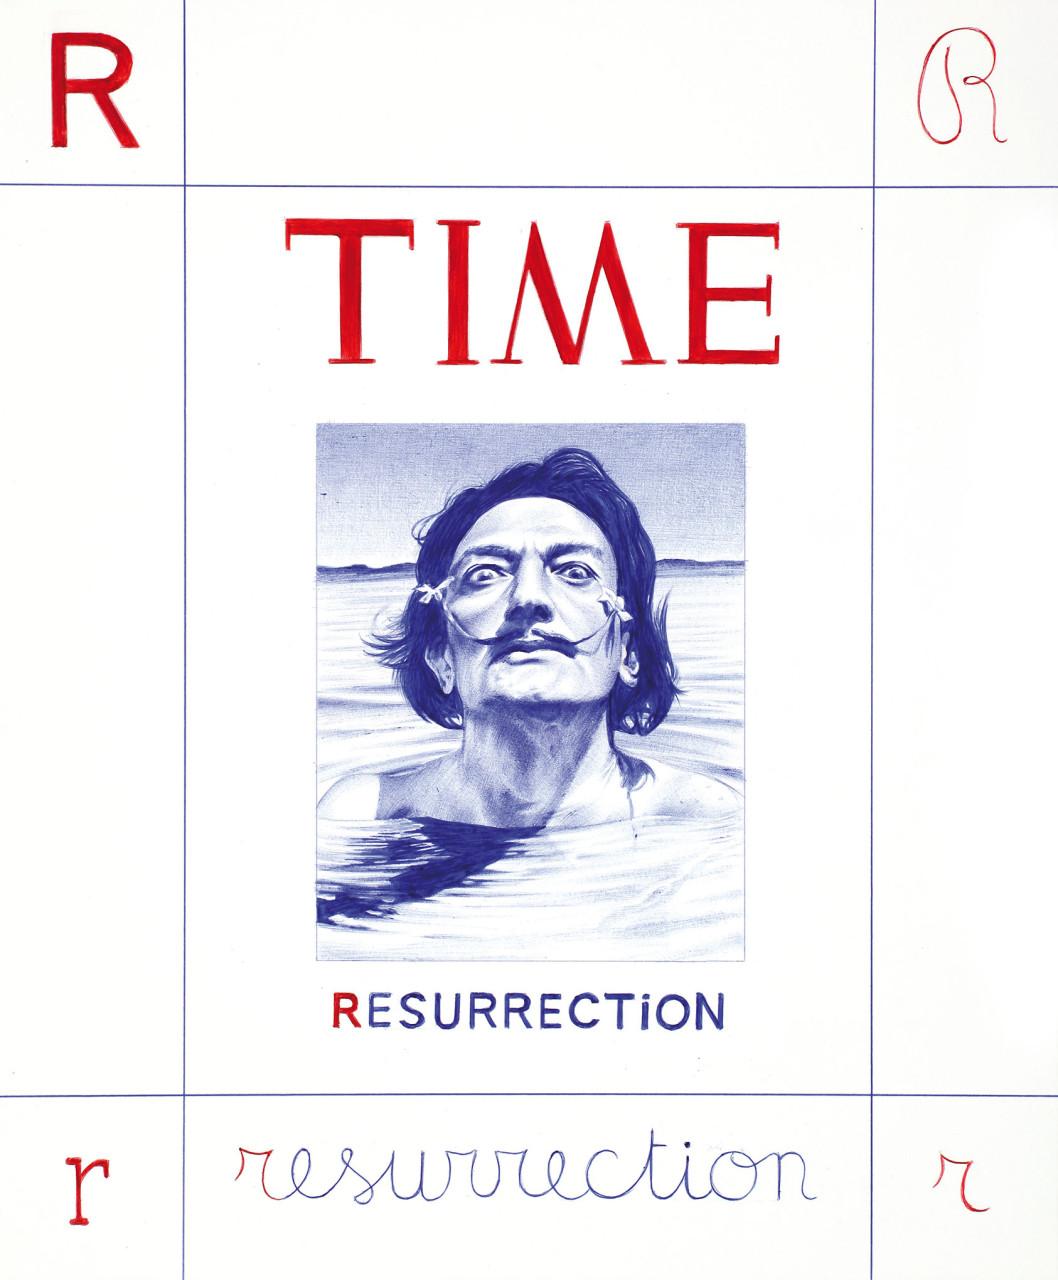 11R-resurrection_bassa